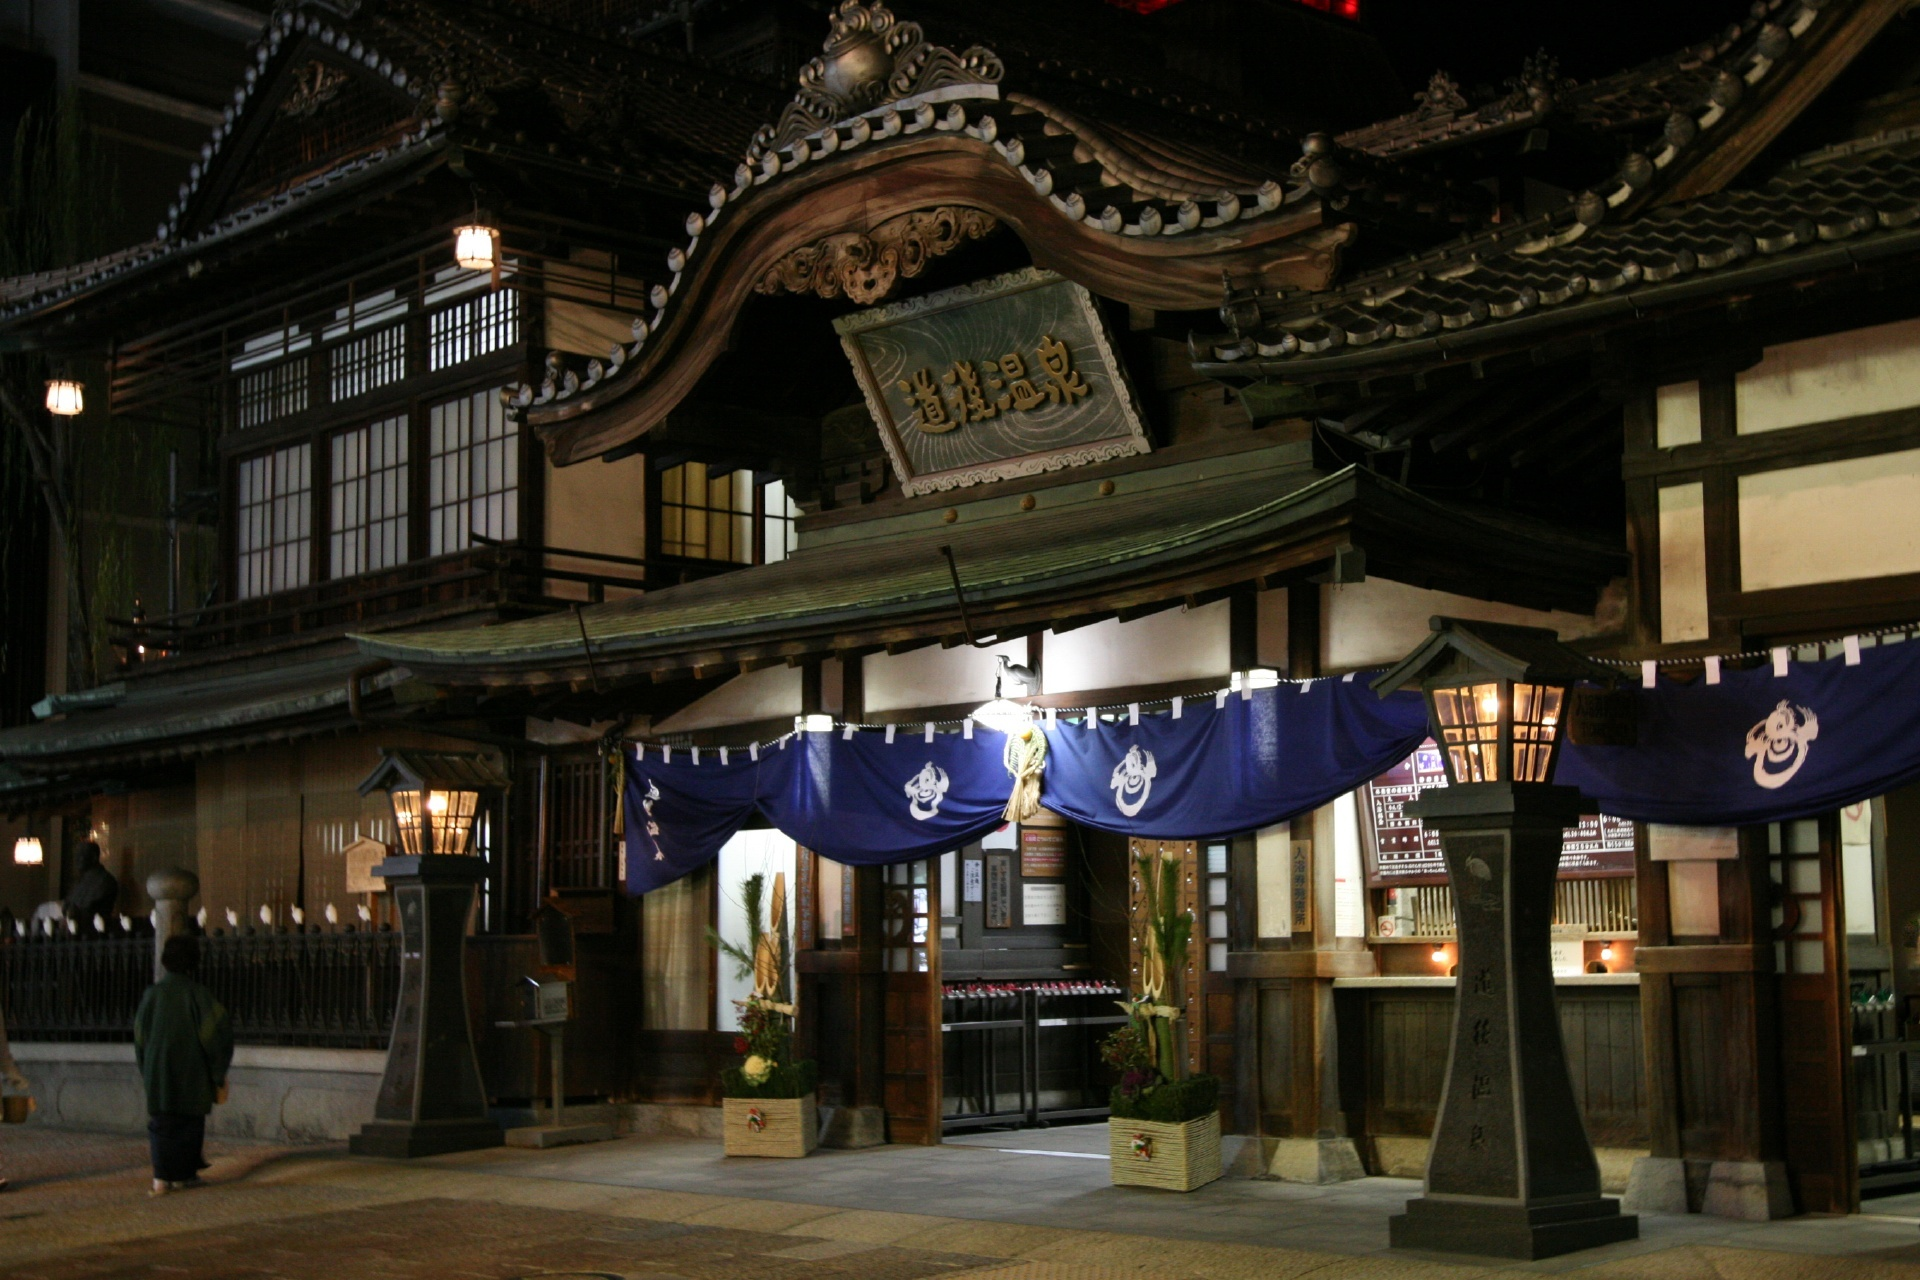 夜の道後温泉 愛媛の風景